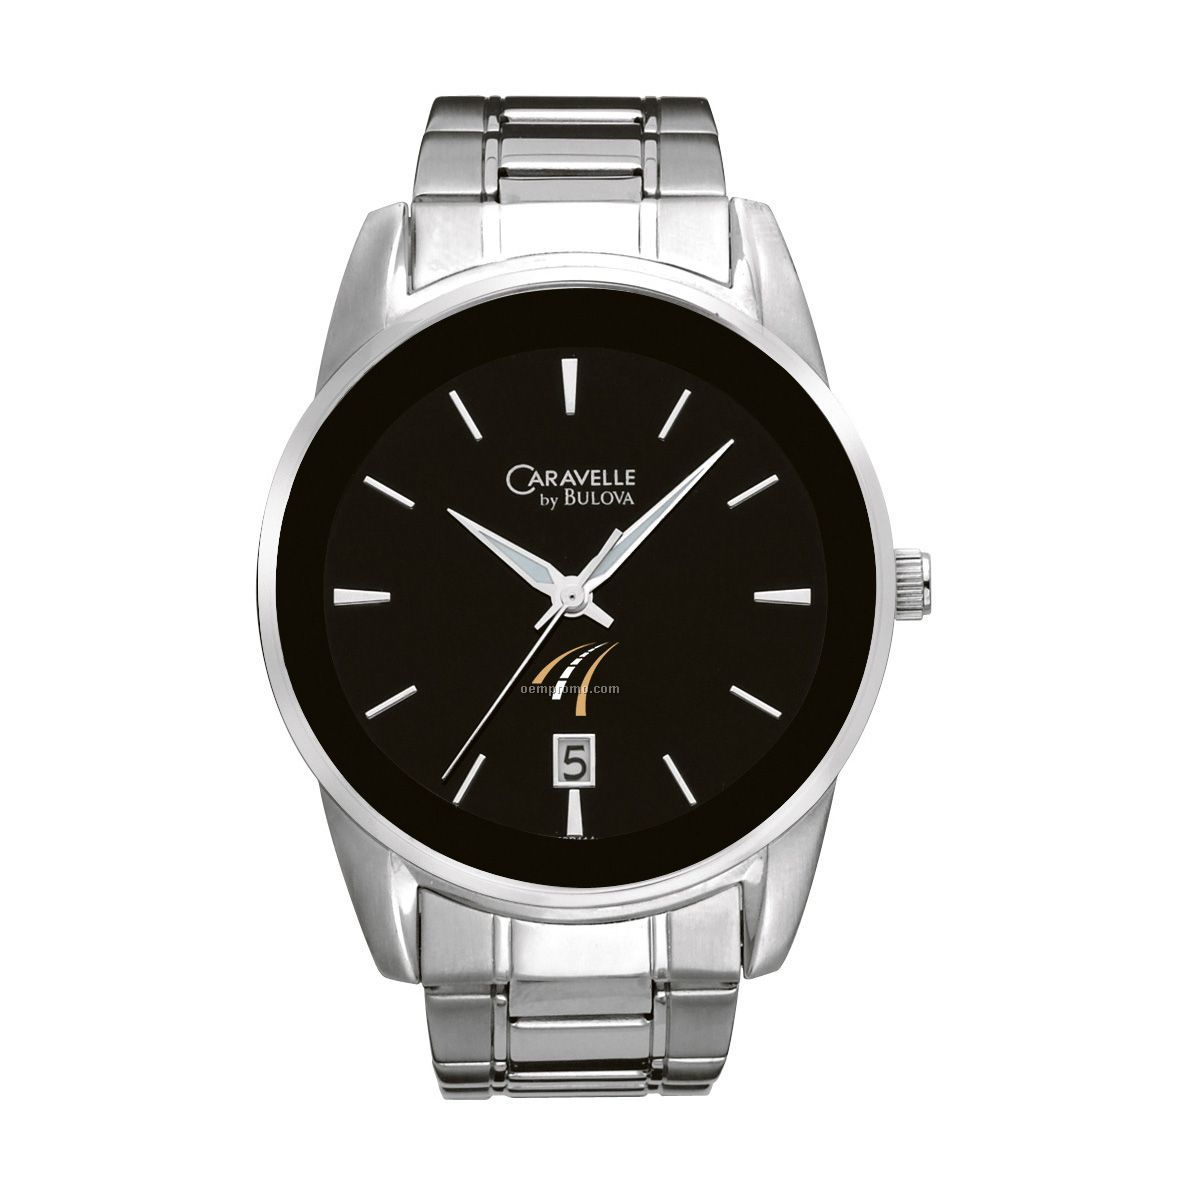 Wrist watch for men flipkart online